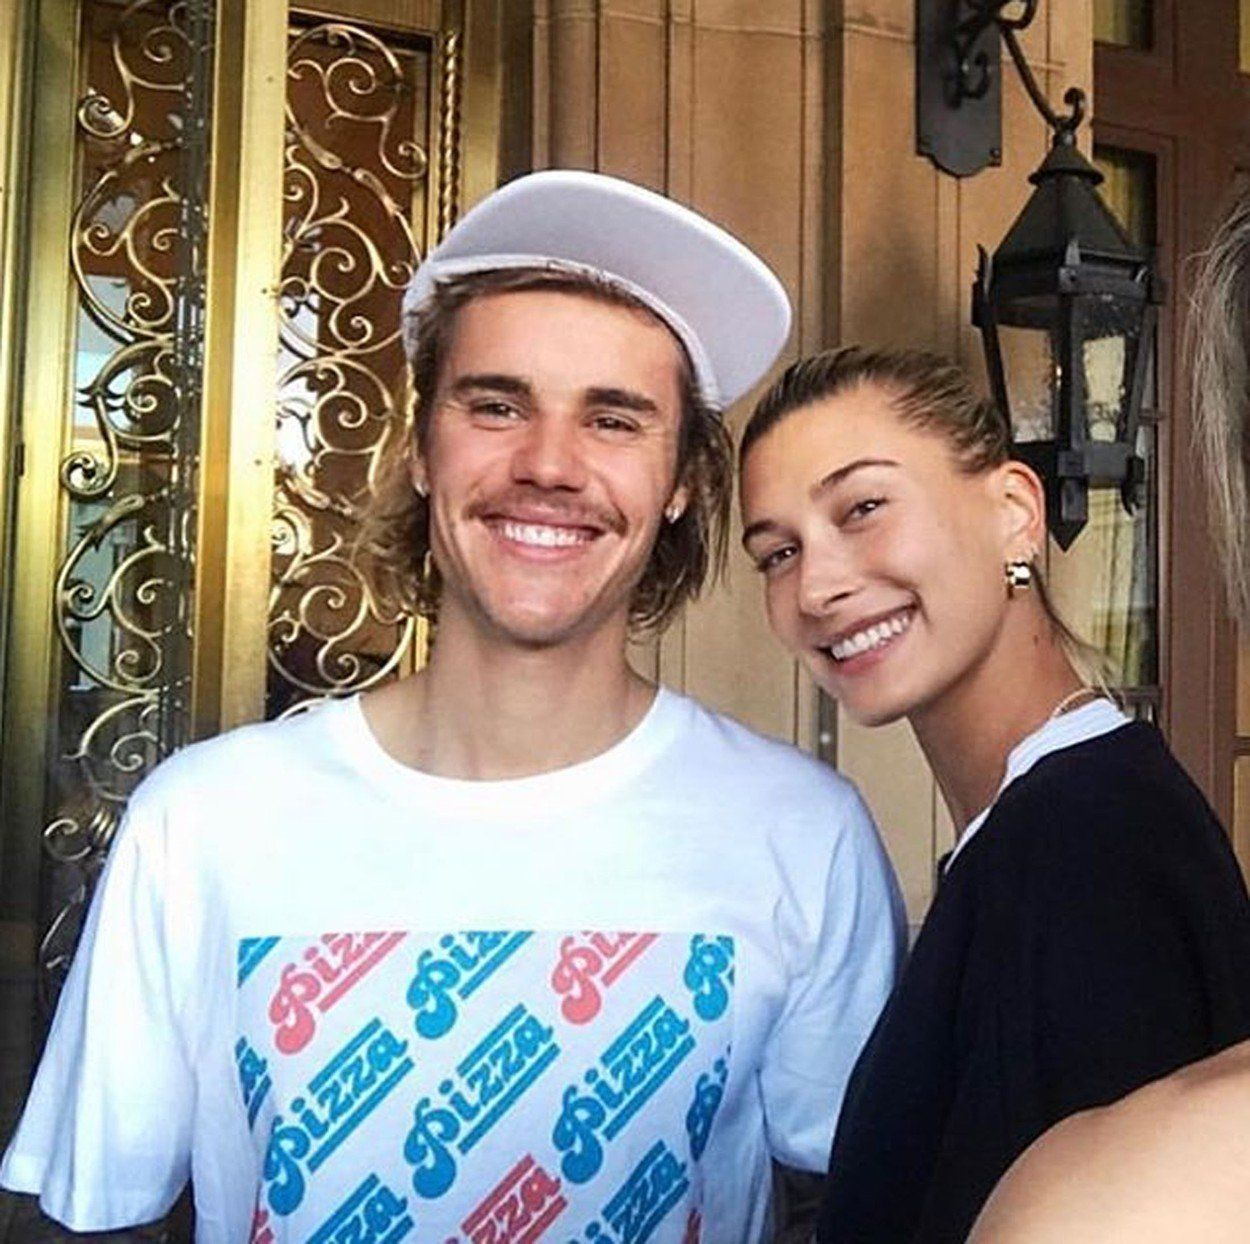 Justin Bieber és Hailey Baldwin - Fotó: Profimedia